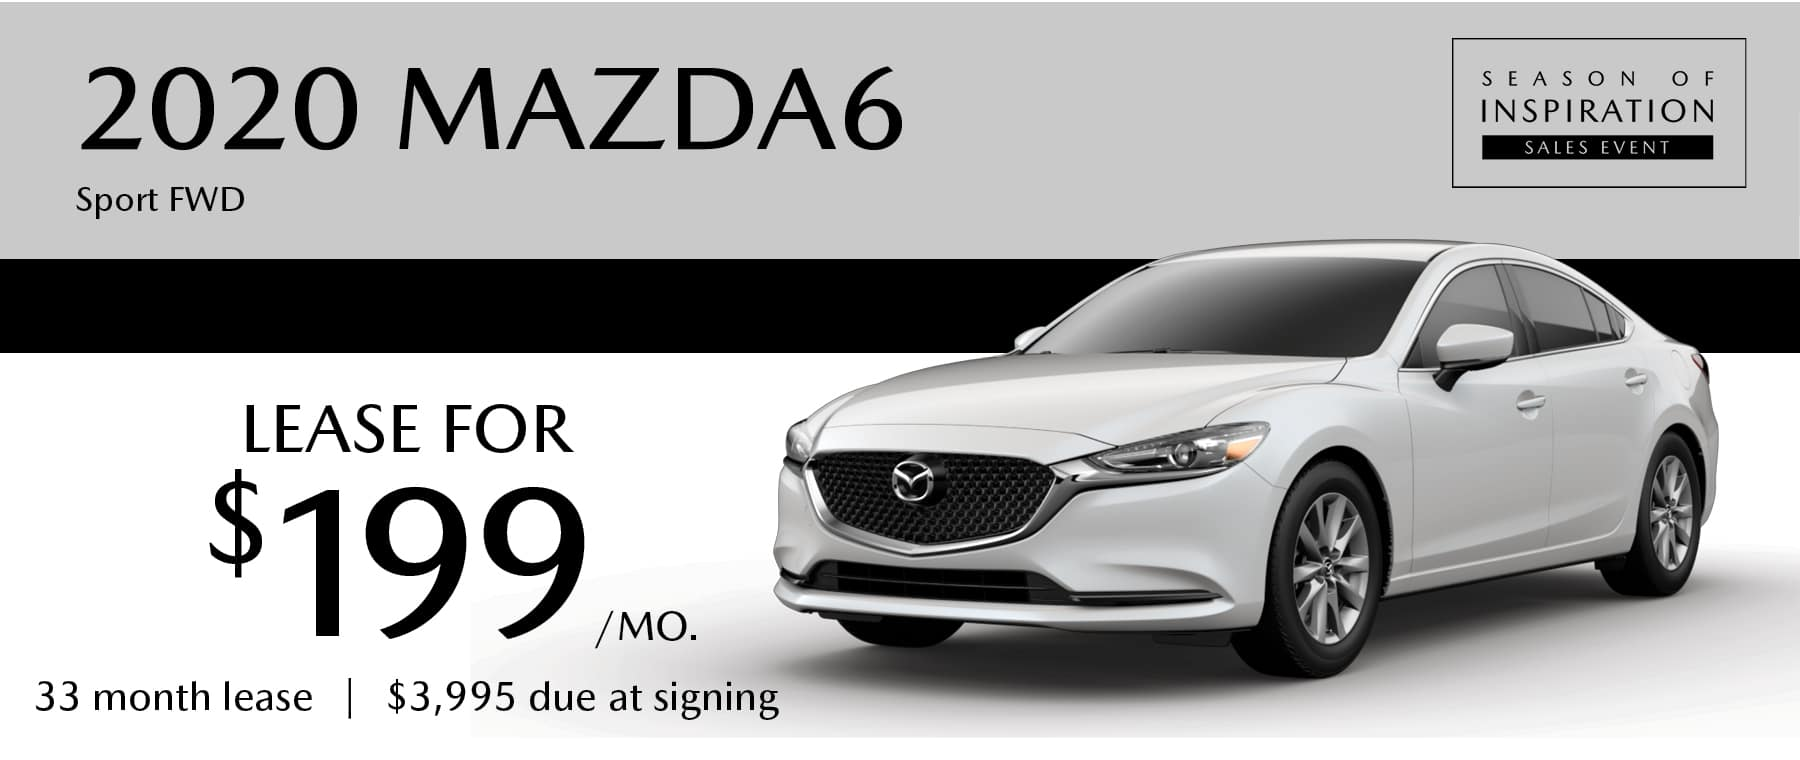 2020 Mazda6 Sport FWD Lease in Greensburg PA